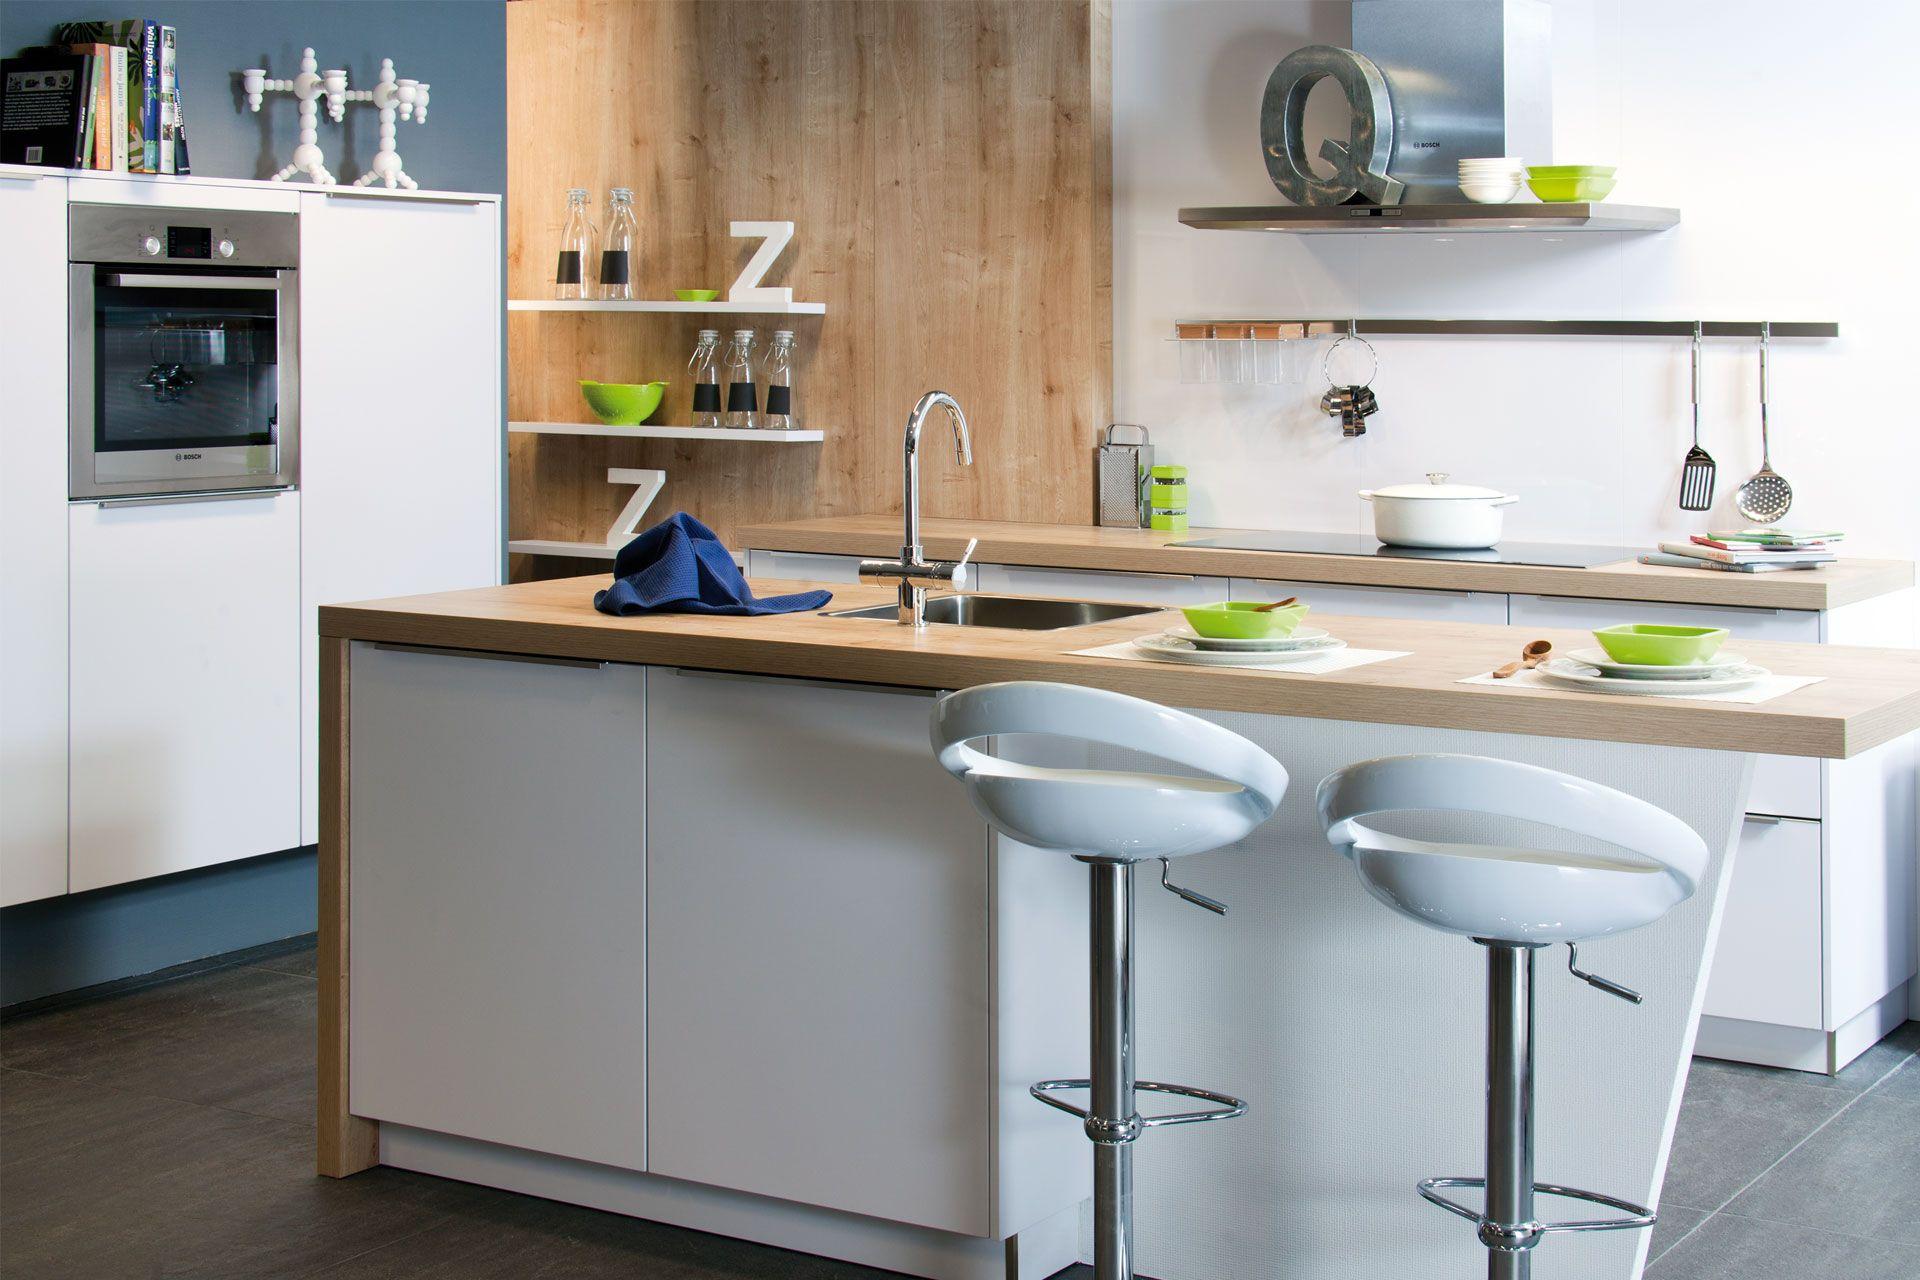 Keuken kleine ruimte - Keuken kleine ruimte ...